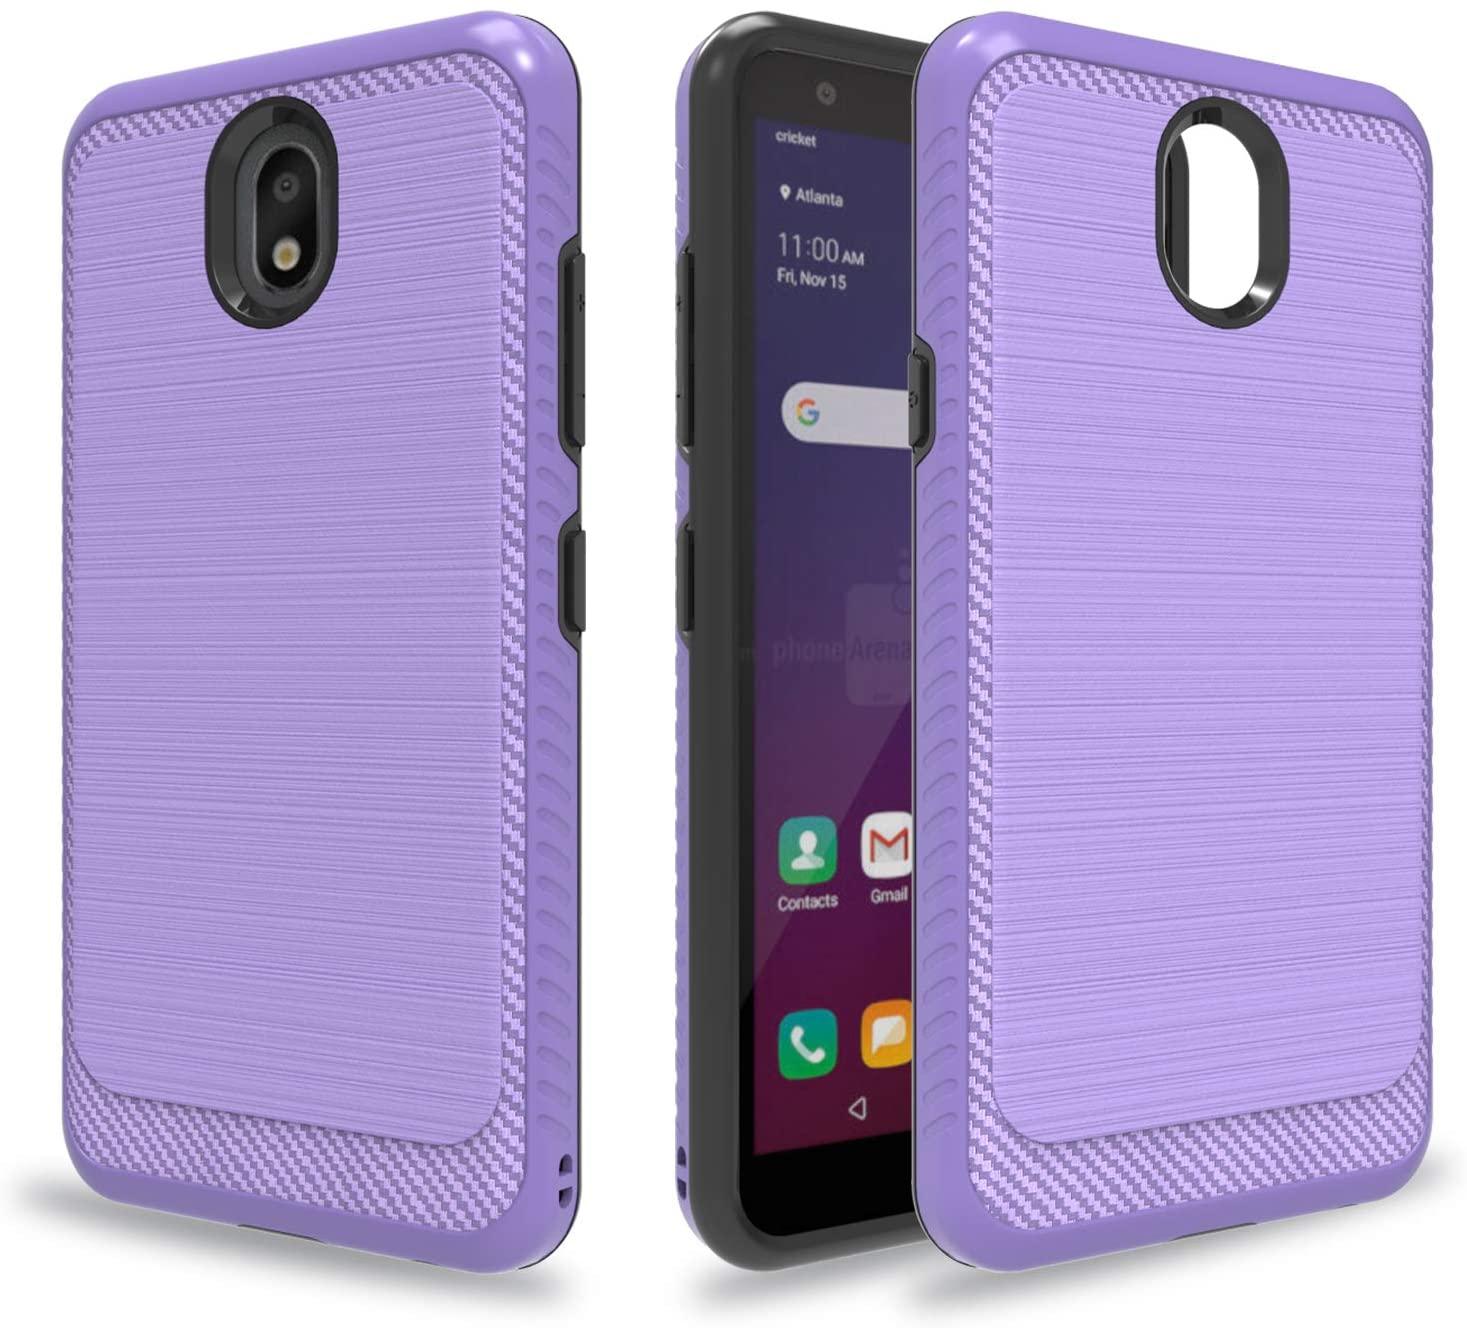 Ayoo:LG Escape Plus Case,LG X2 2019 Case,LG Tribute Royal Case,LG Journey LTE/ K30 2019/ LG Arena 2 Case,Brushed Texture Full-Body Shockproof Protective Cases Design for LG Escape Plus-HLS Purple